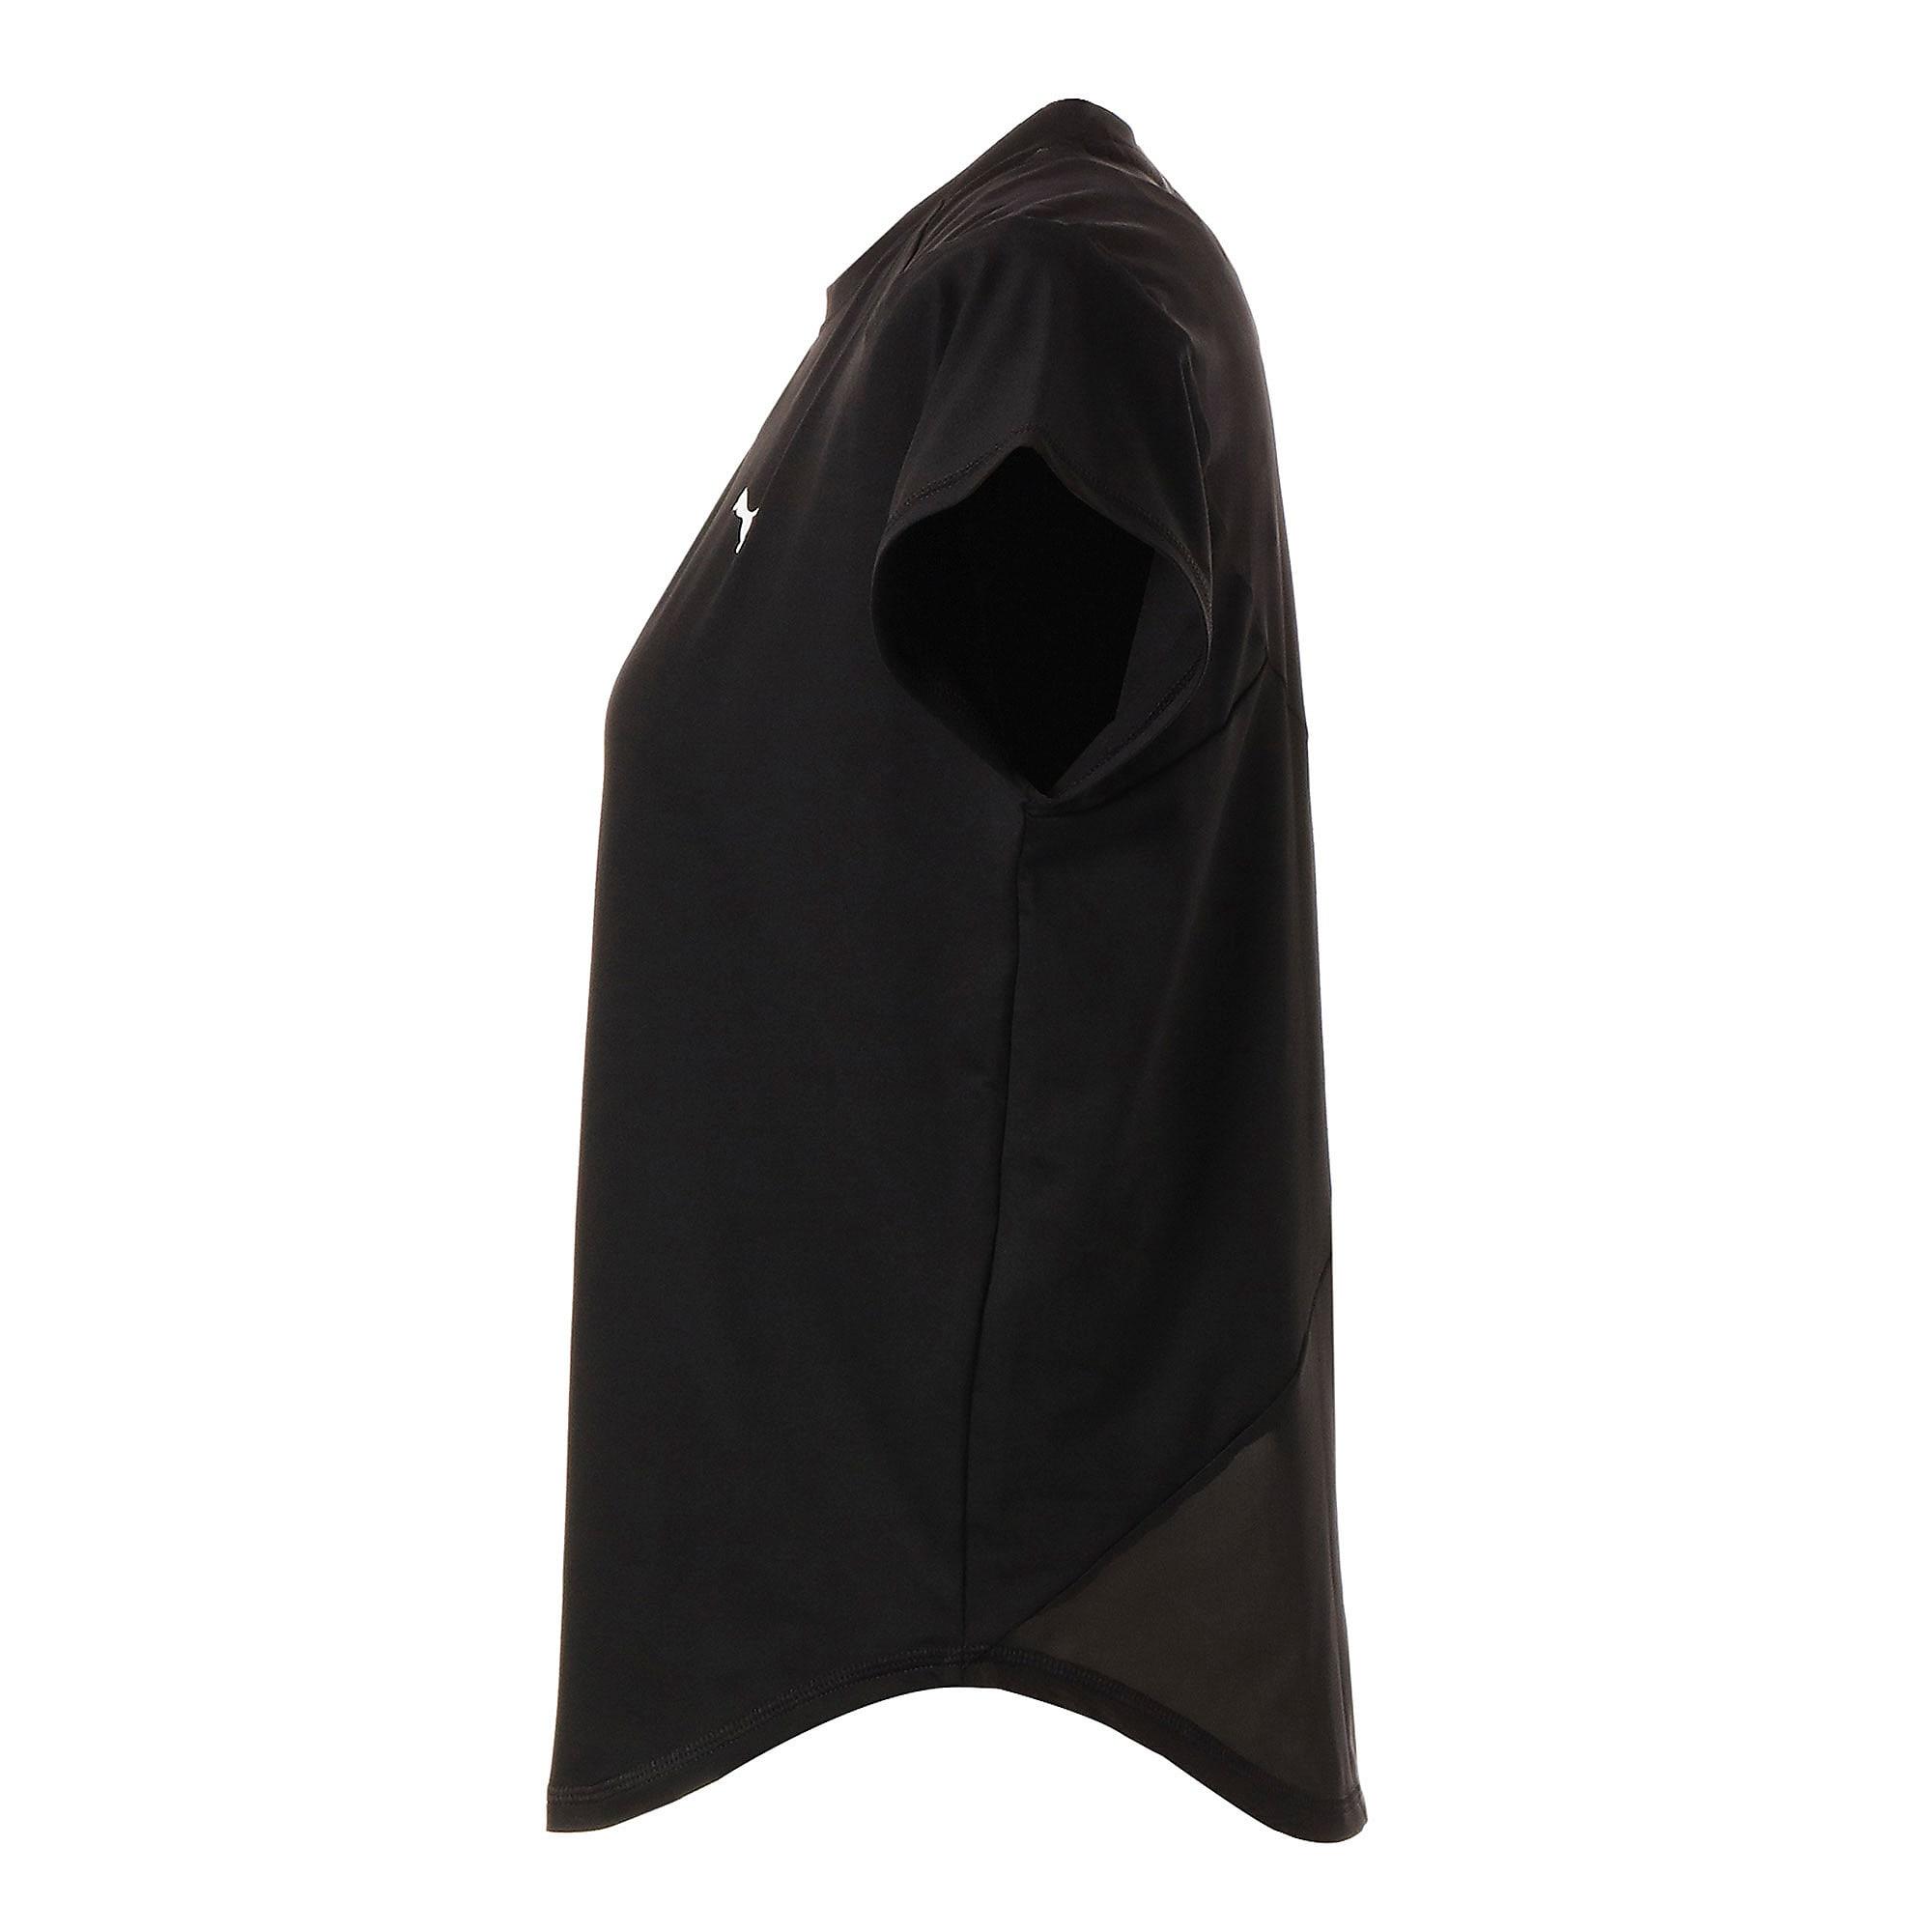 Thumbnail 5 of スタジオ SS メッシュ ウィメンズ トレーニング Tシャツ 半袖, Puma Black, medium-JPN